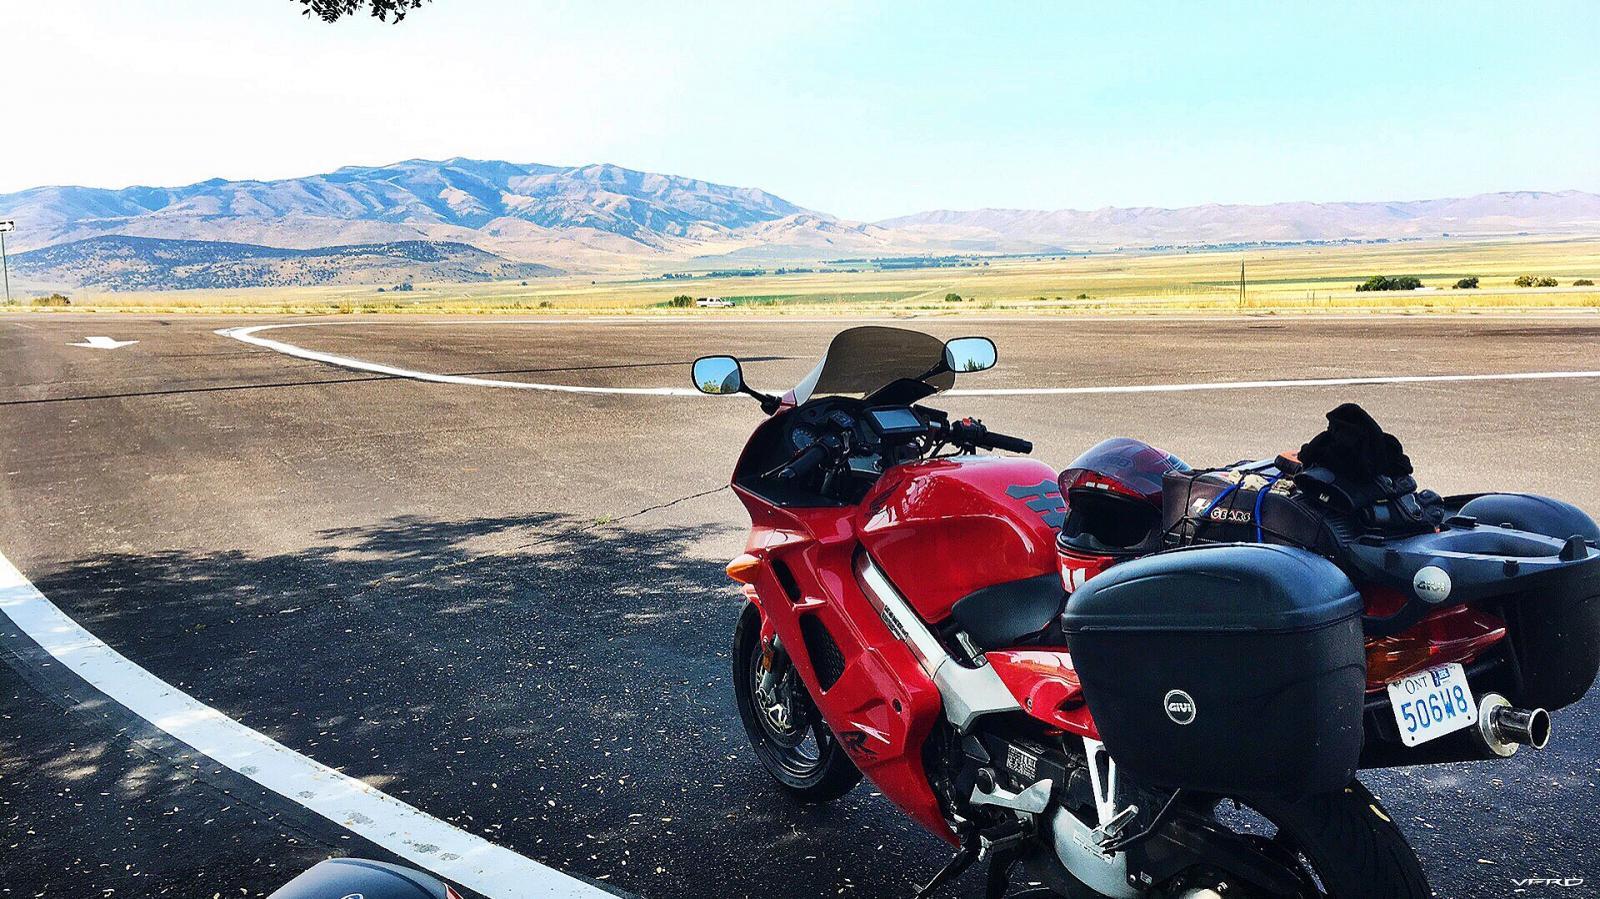 Idaho Rest stop